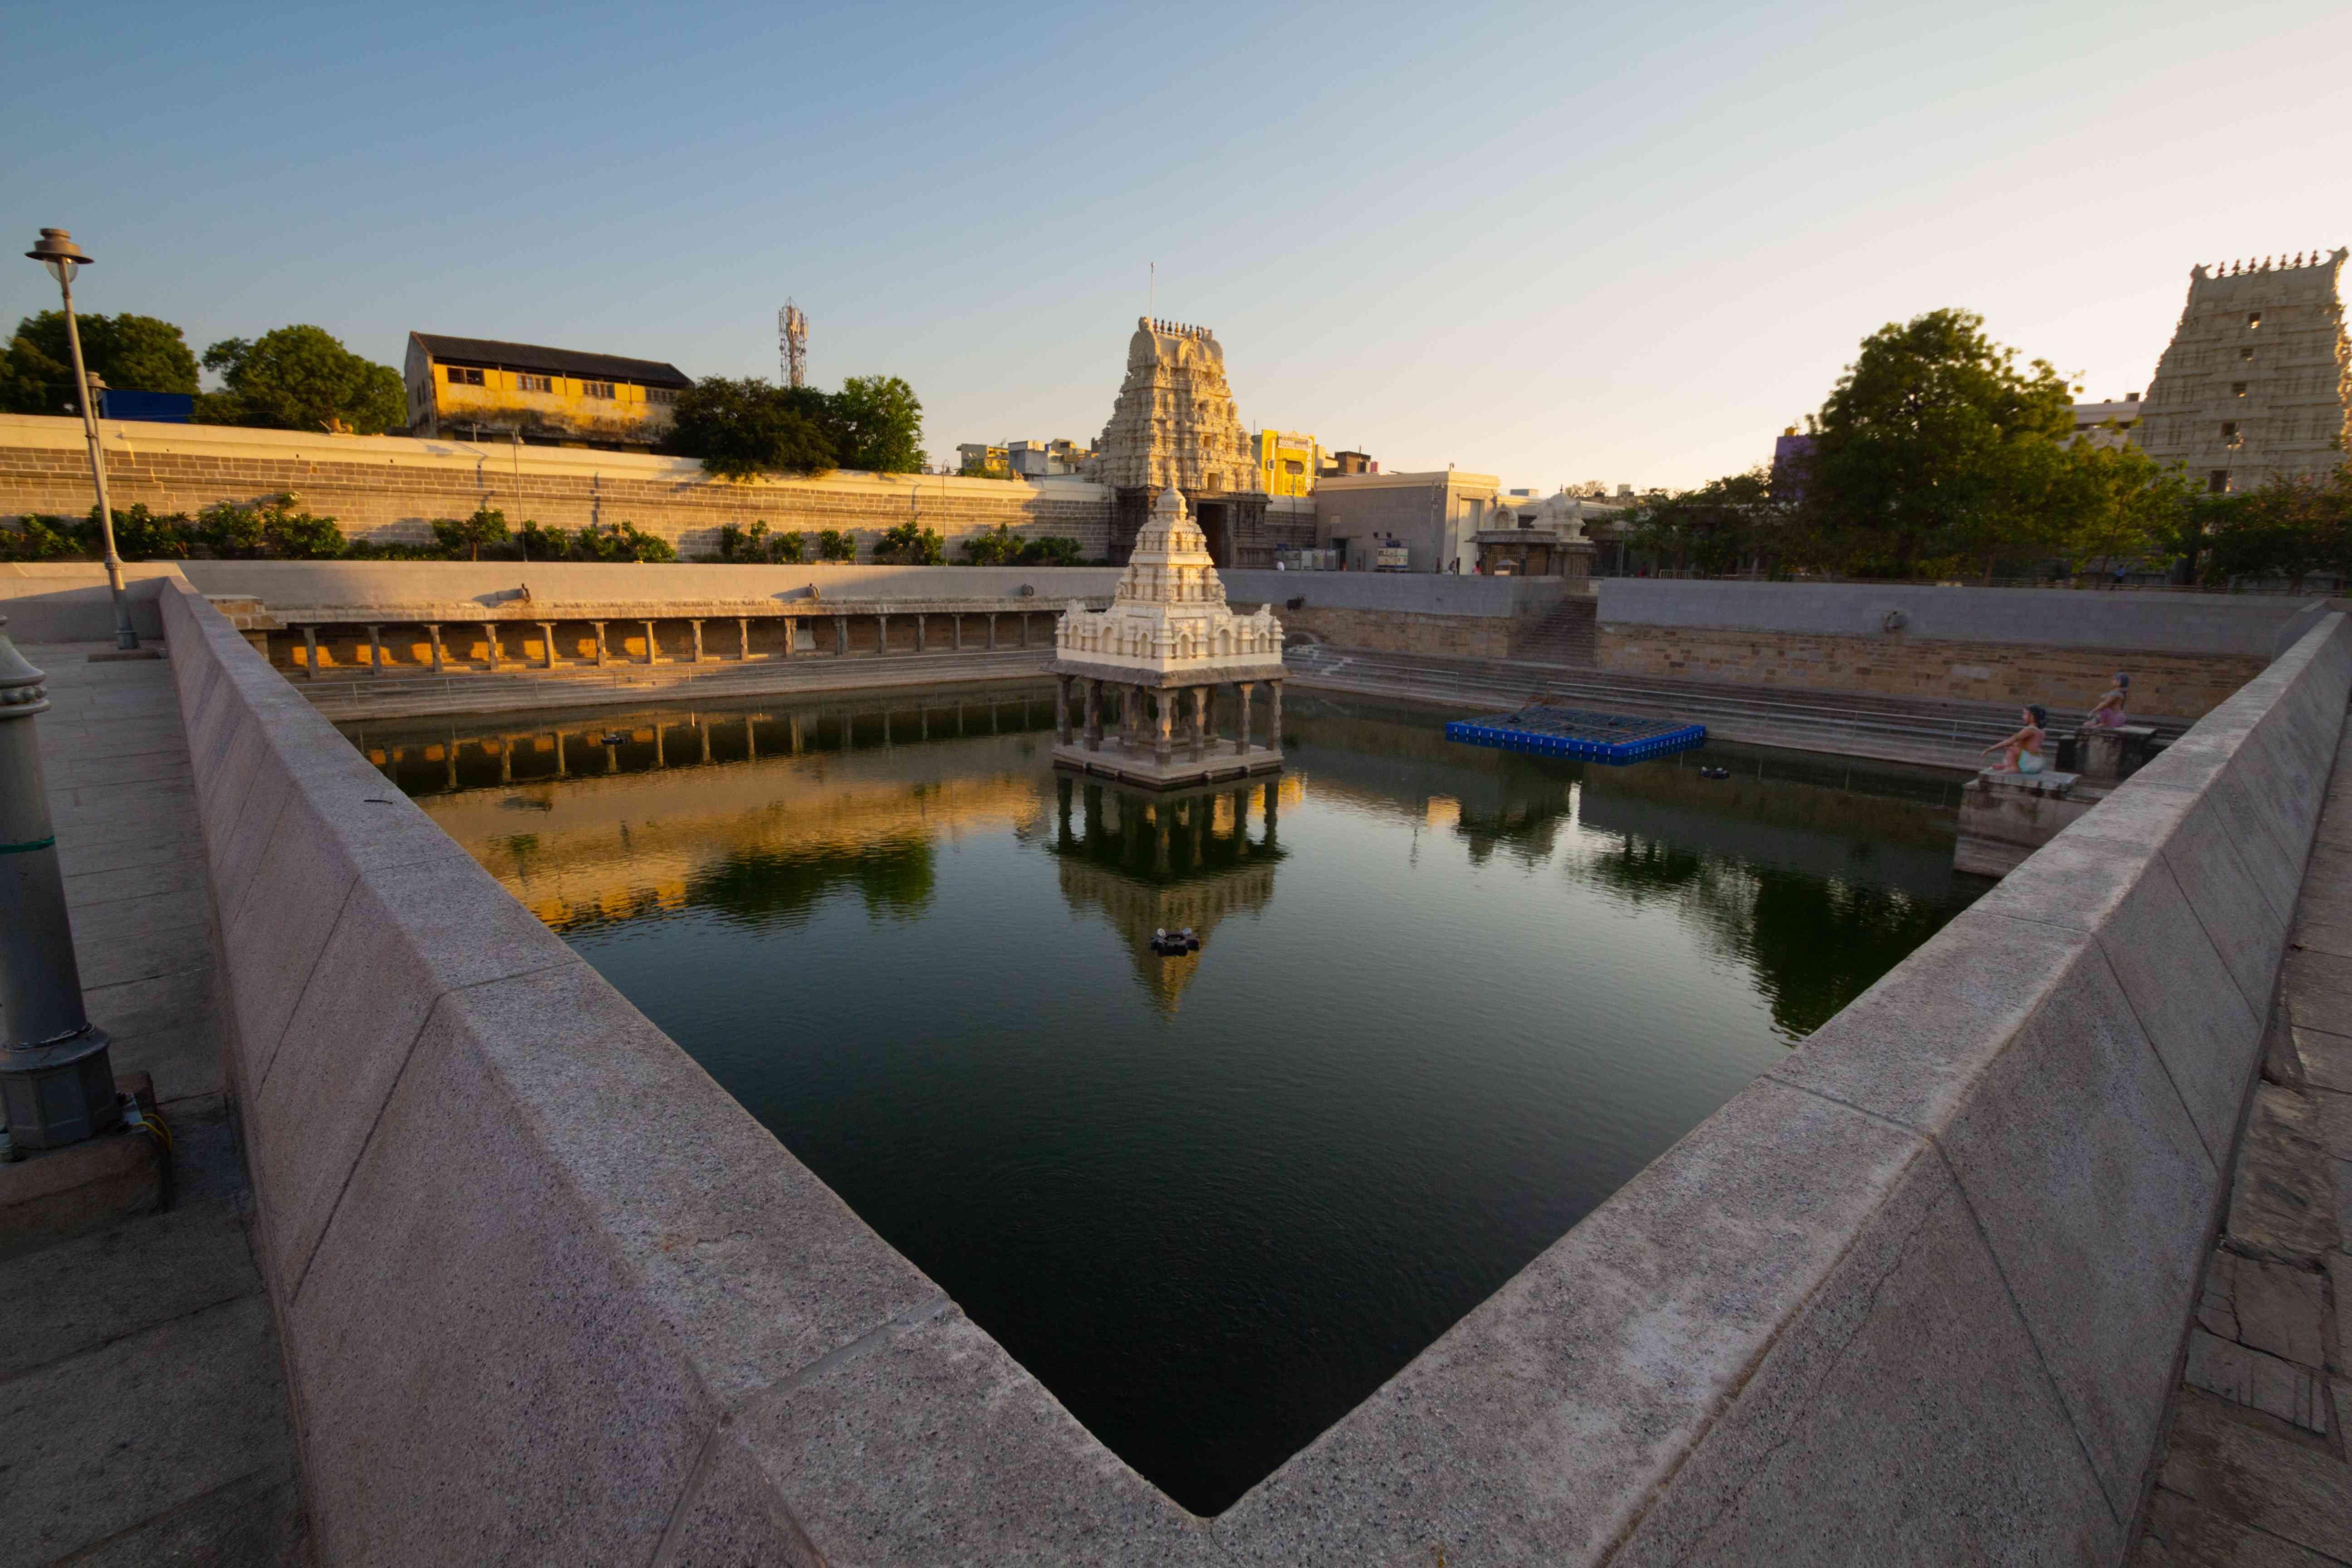 Kamakshi Amman Temple reflecting pool at sunset